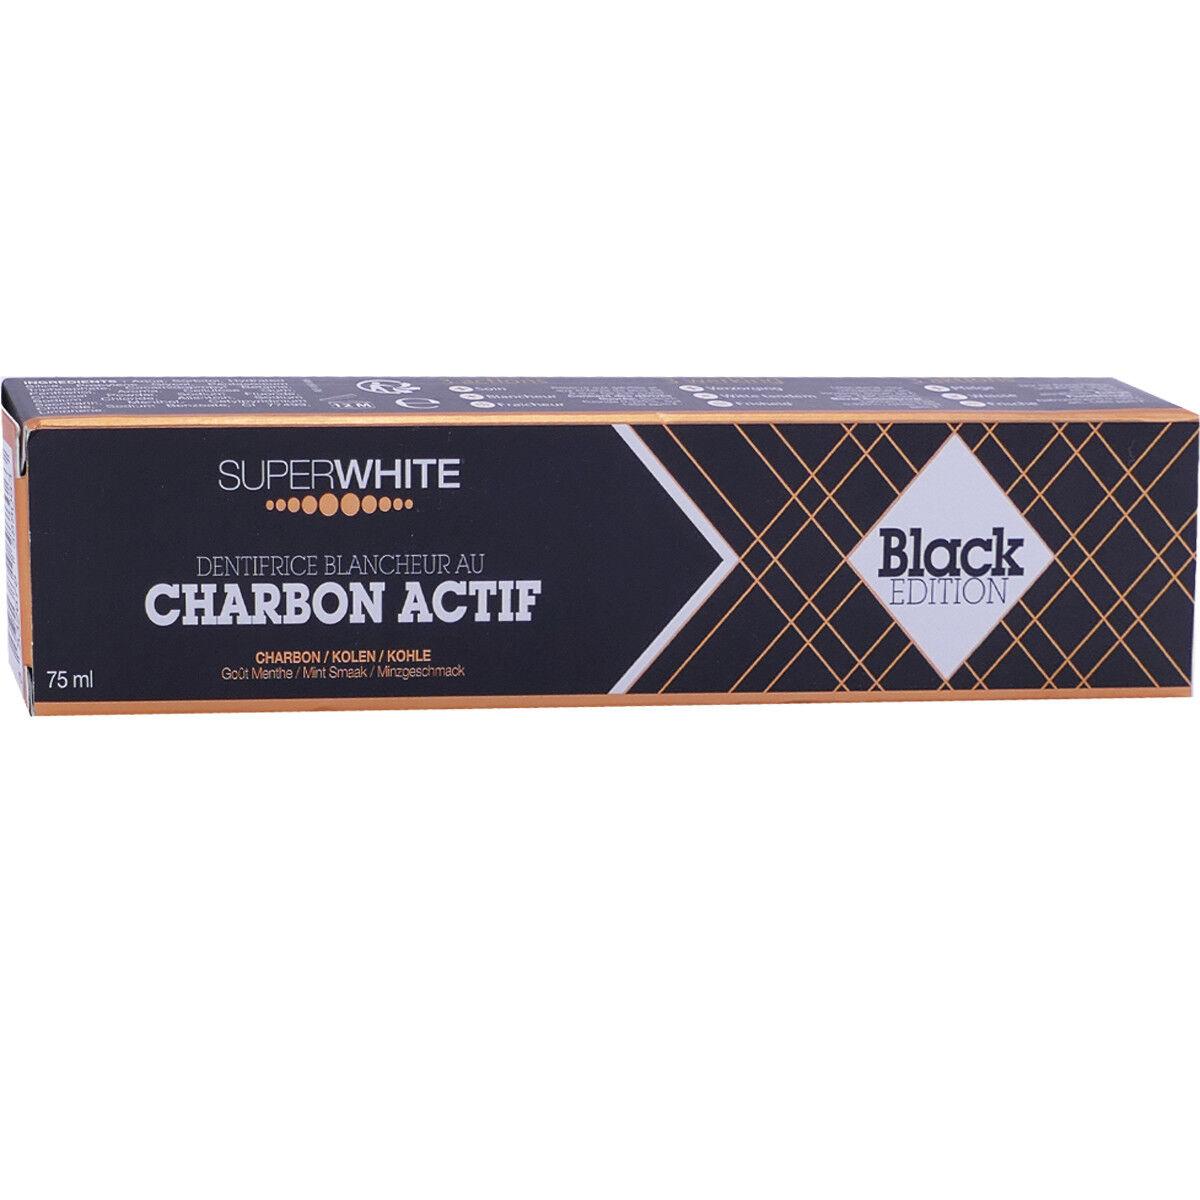 Superwhite charbon actif 75 ml black edition